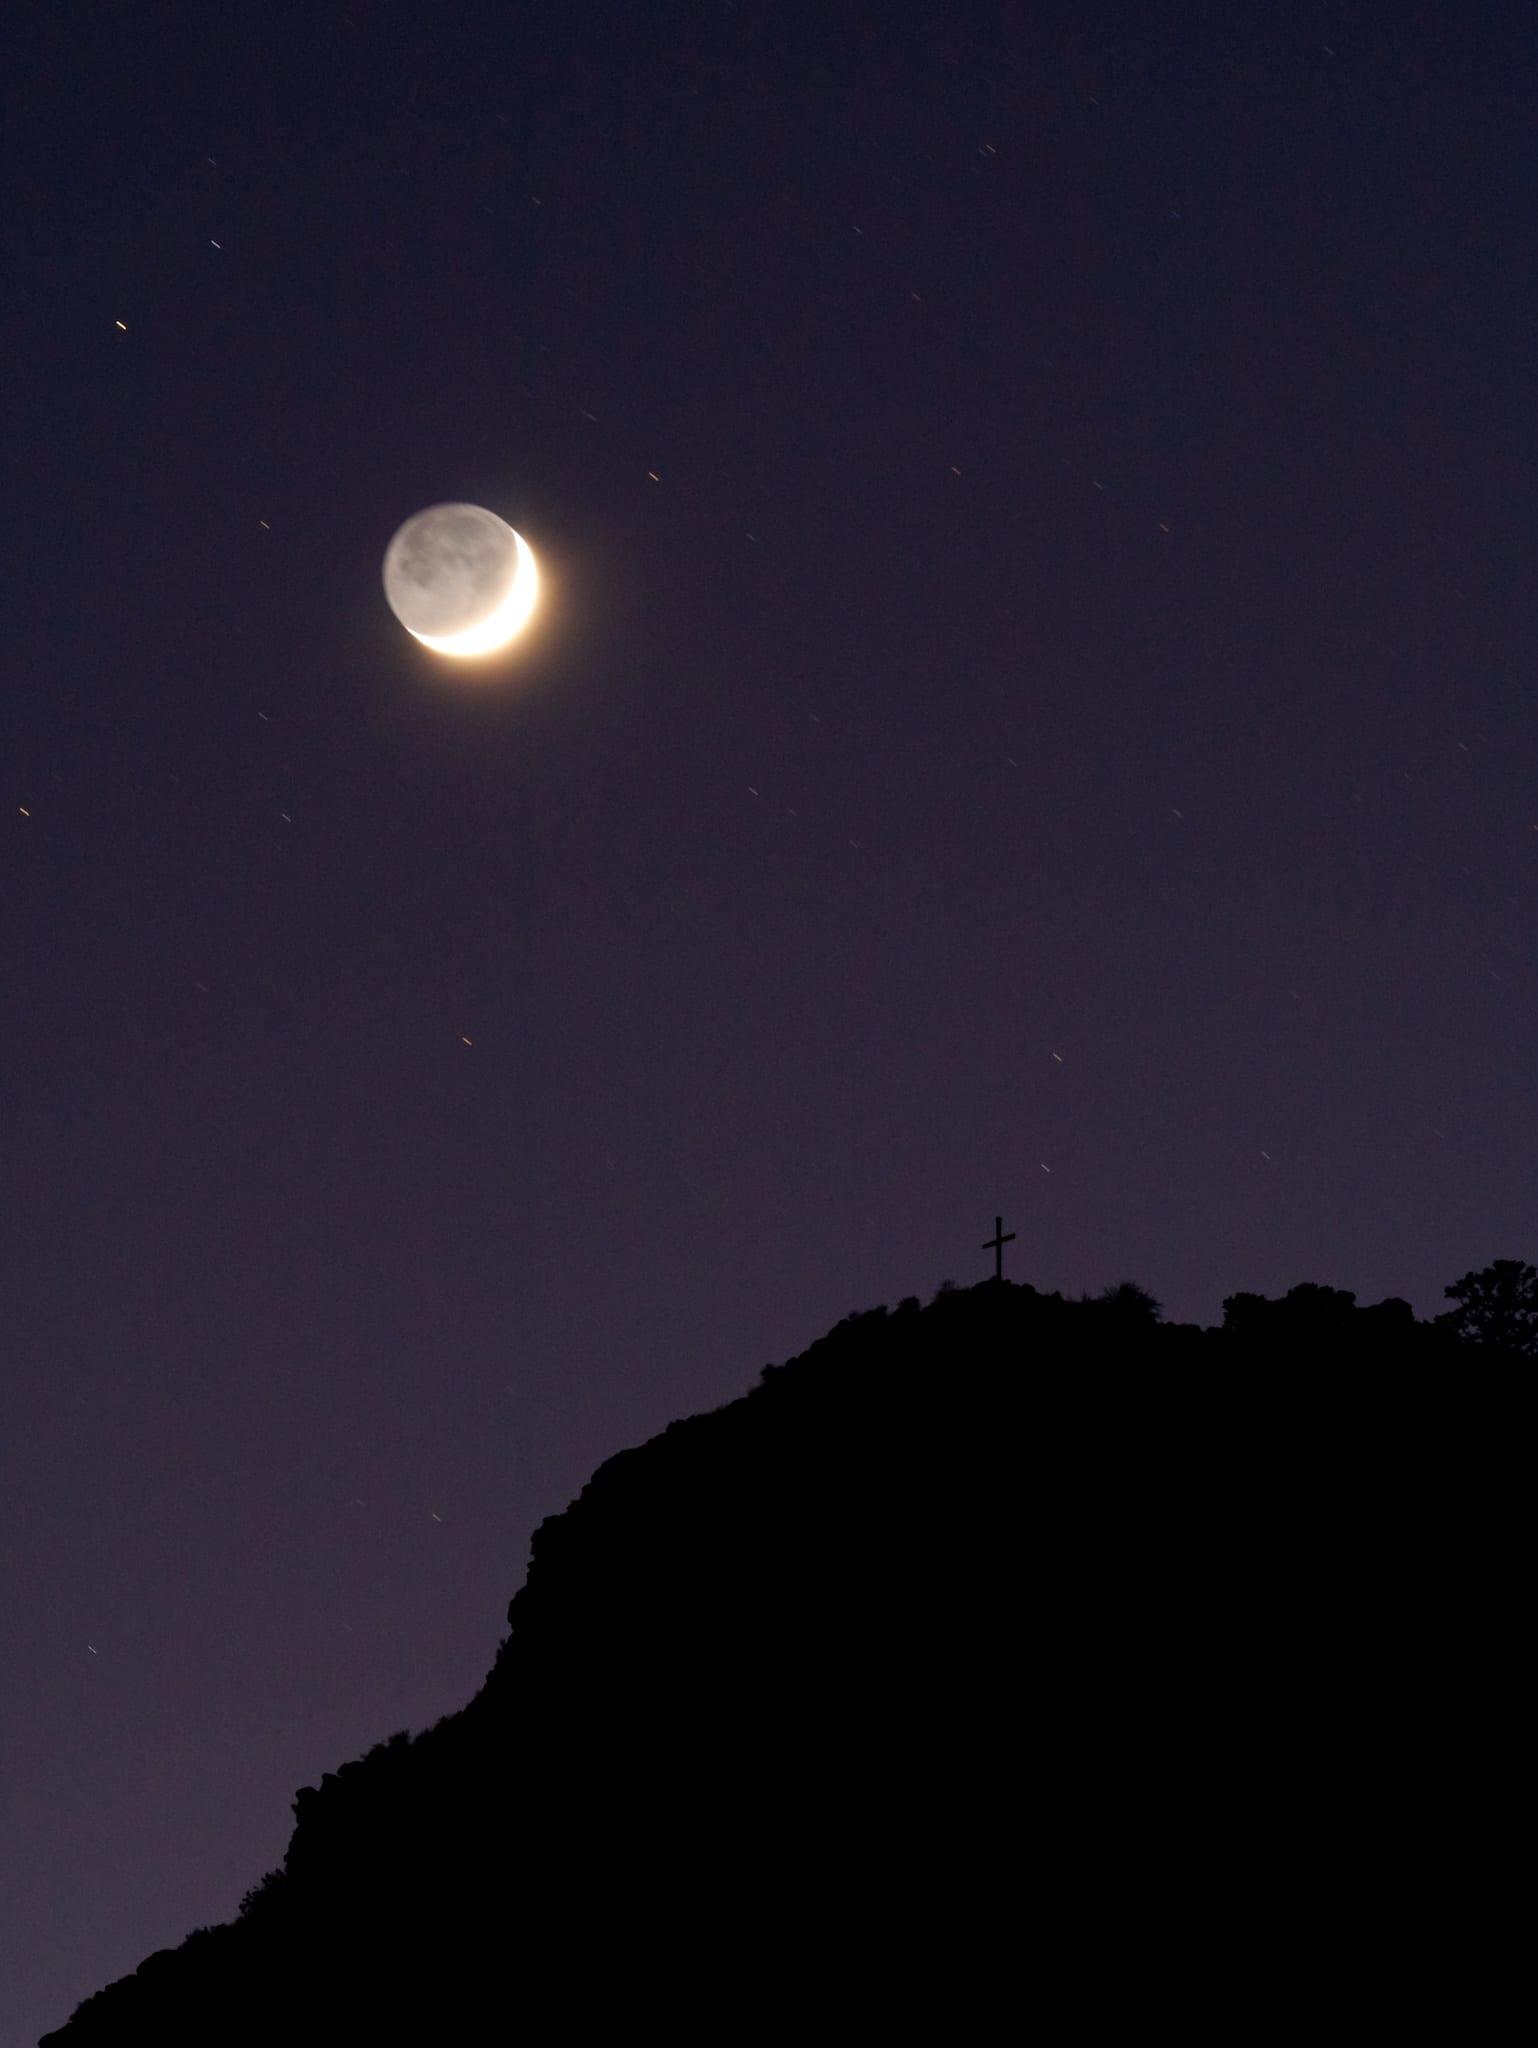 UFO Night Sky Moon and Cross